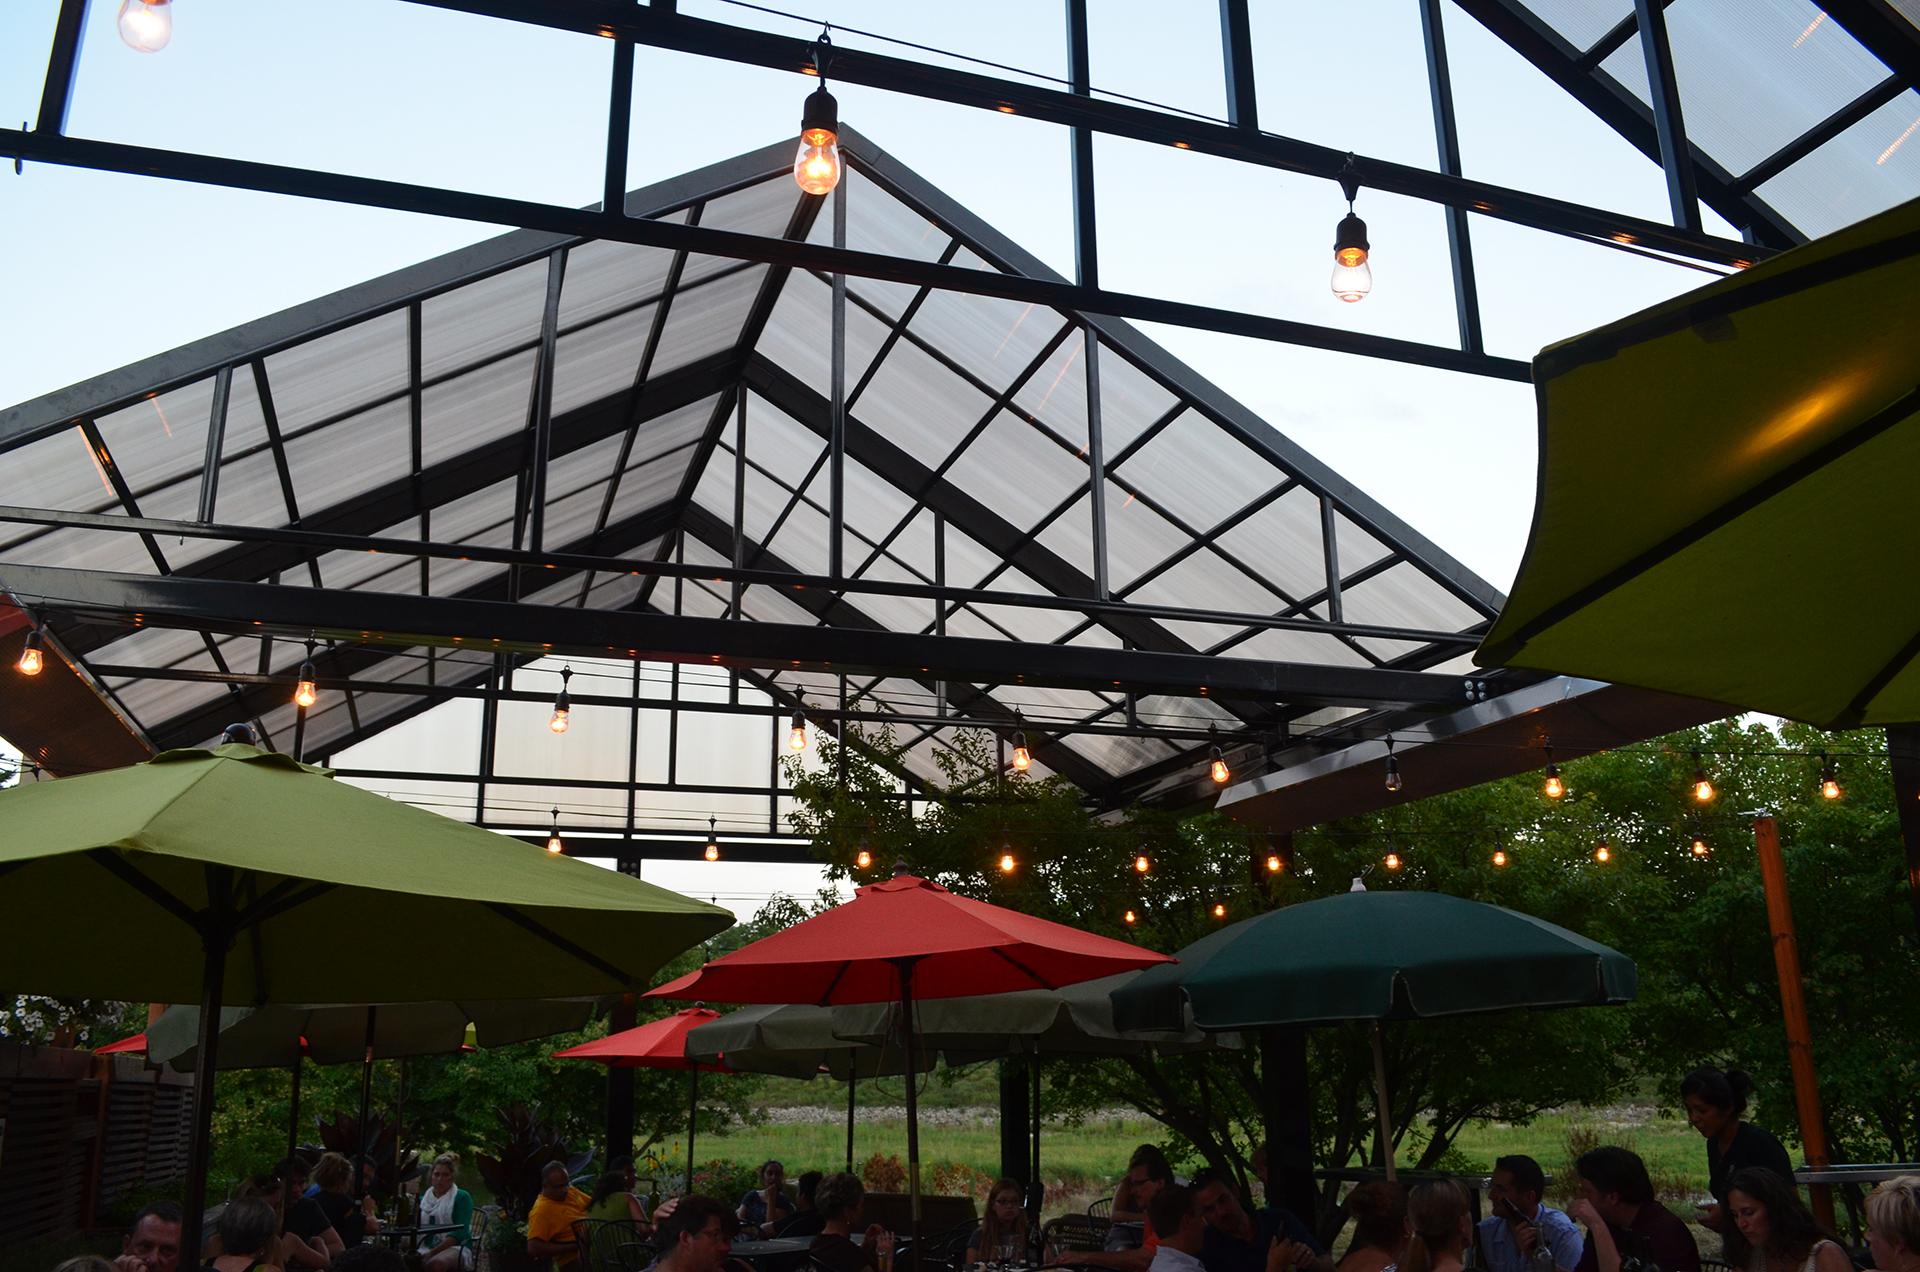 Retractable patio roof over a restaurant patio